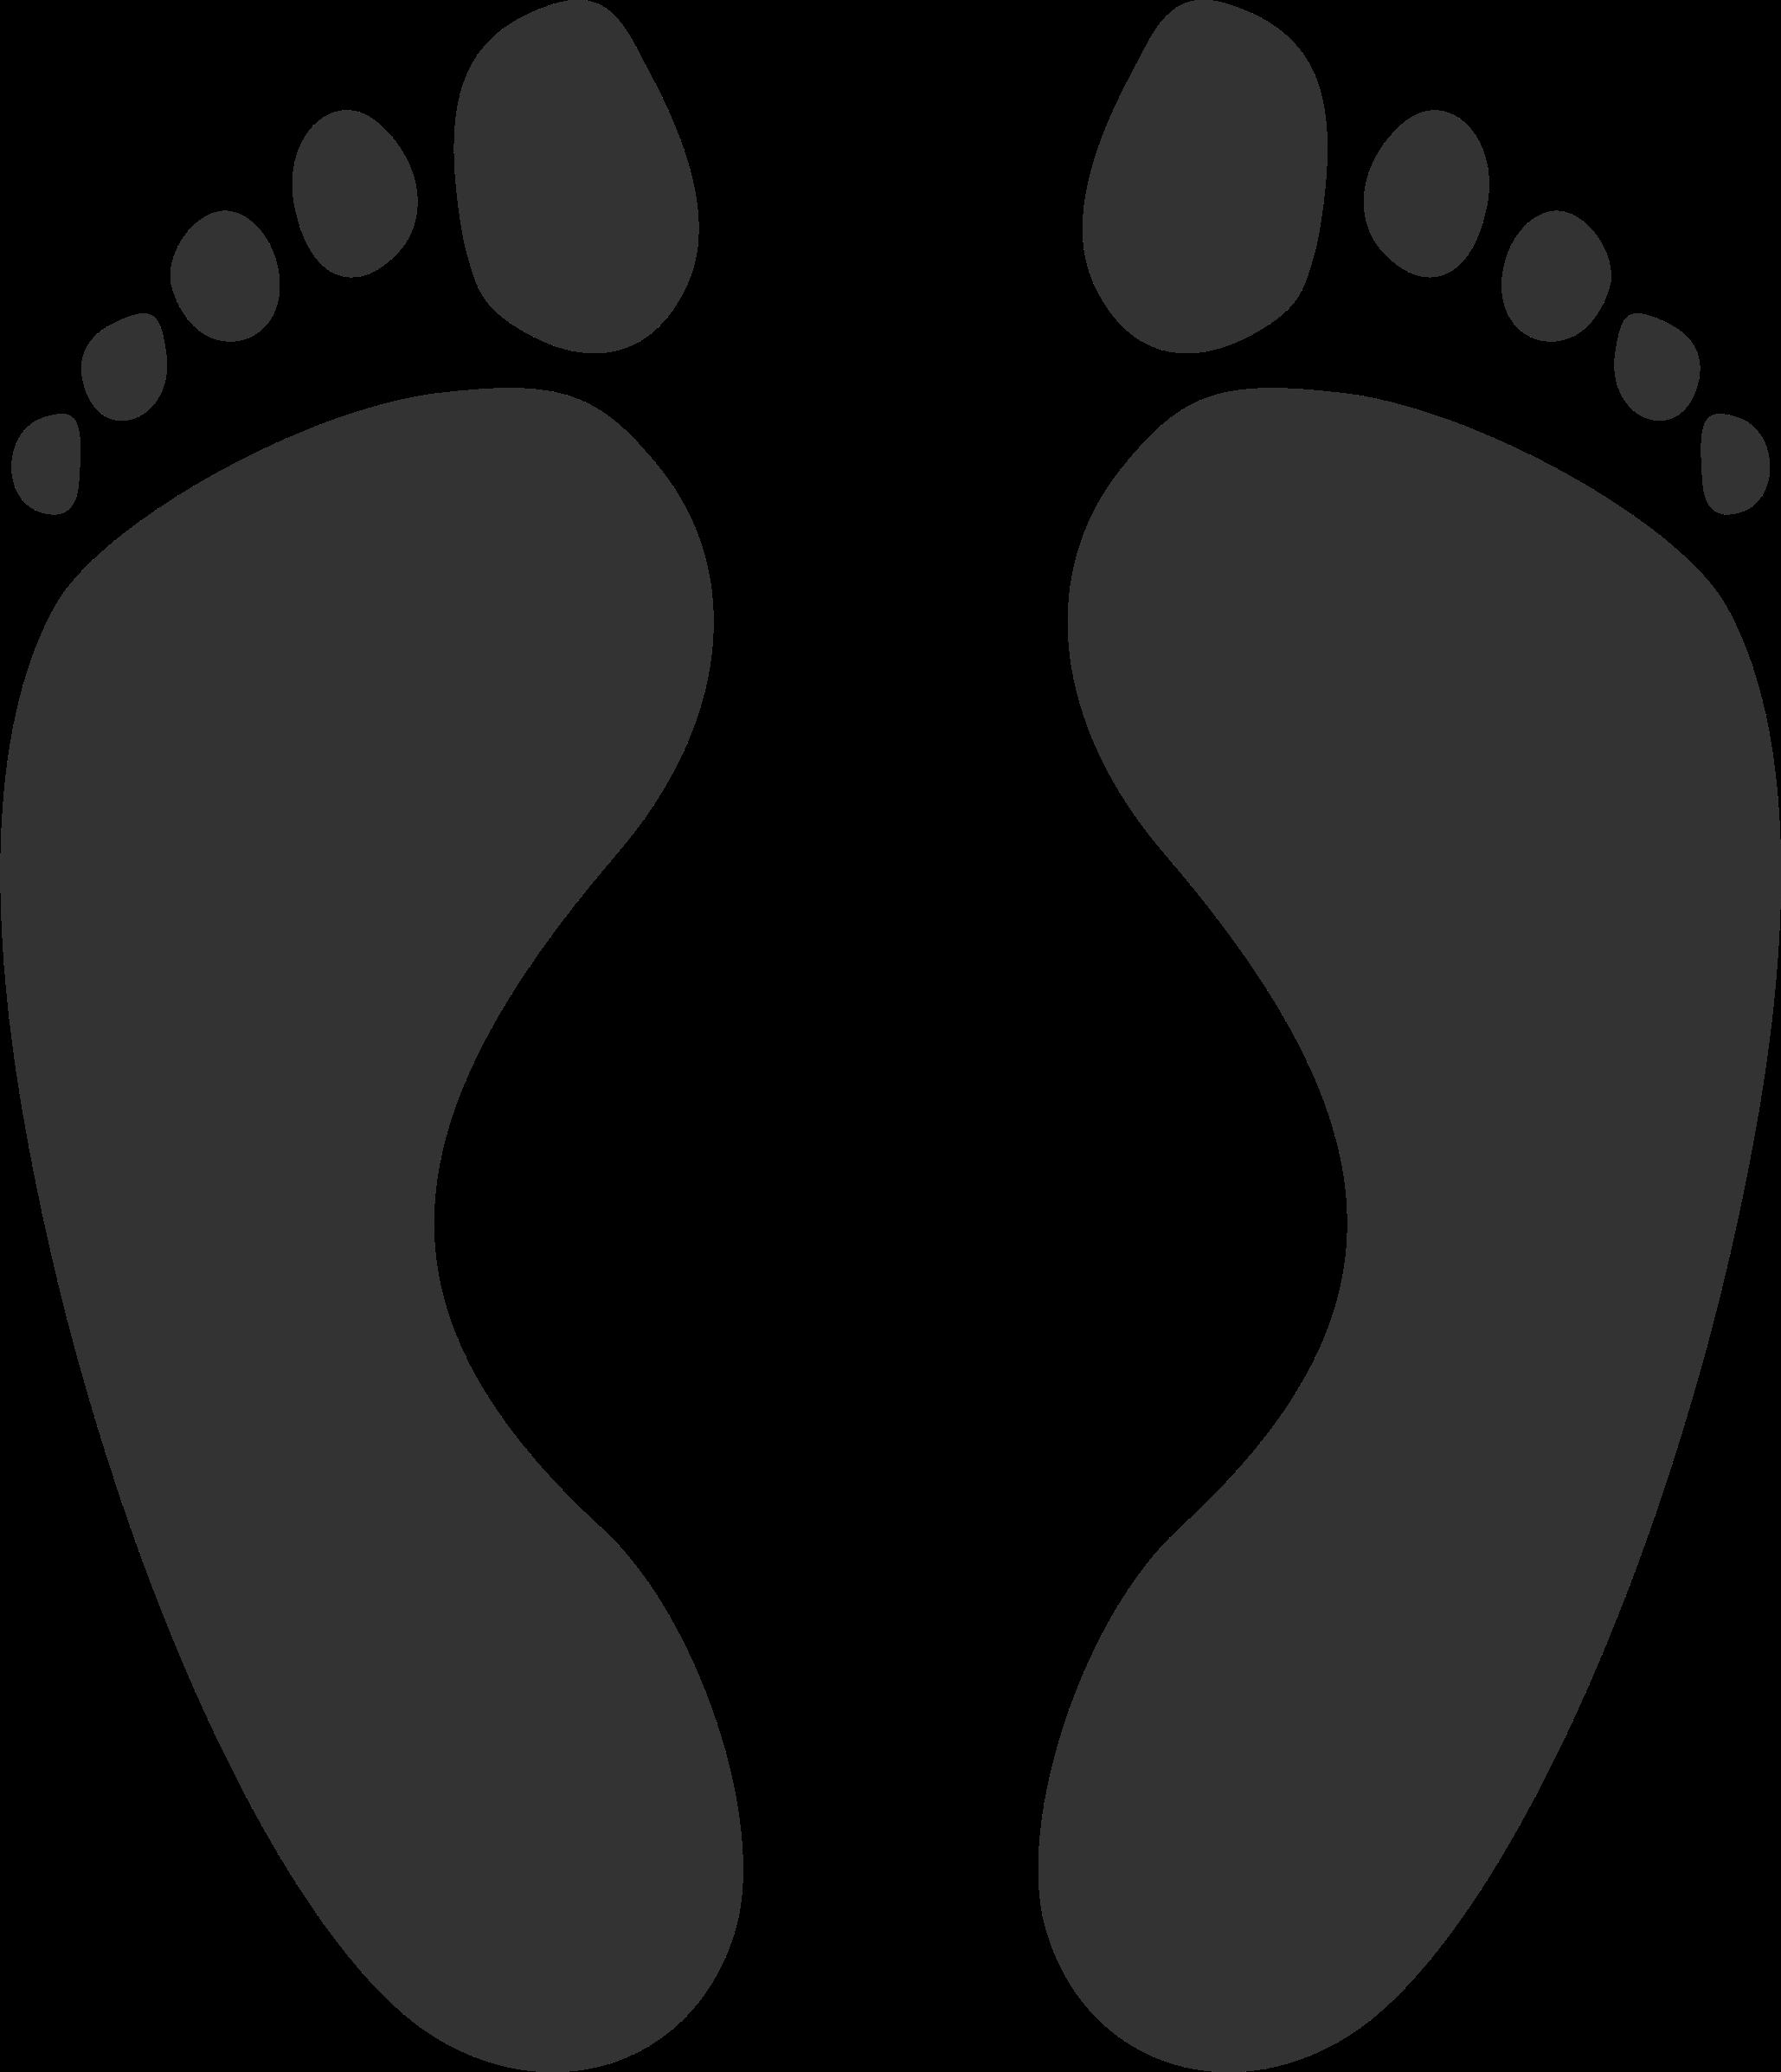 Soles feet big image. Foot clipart printable